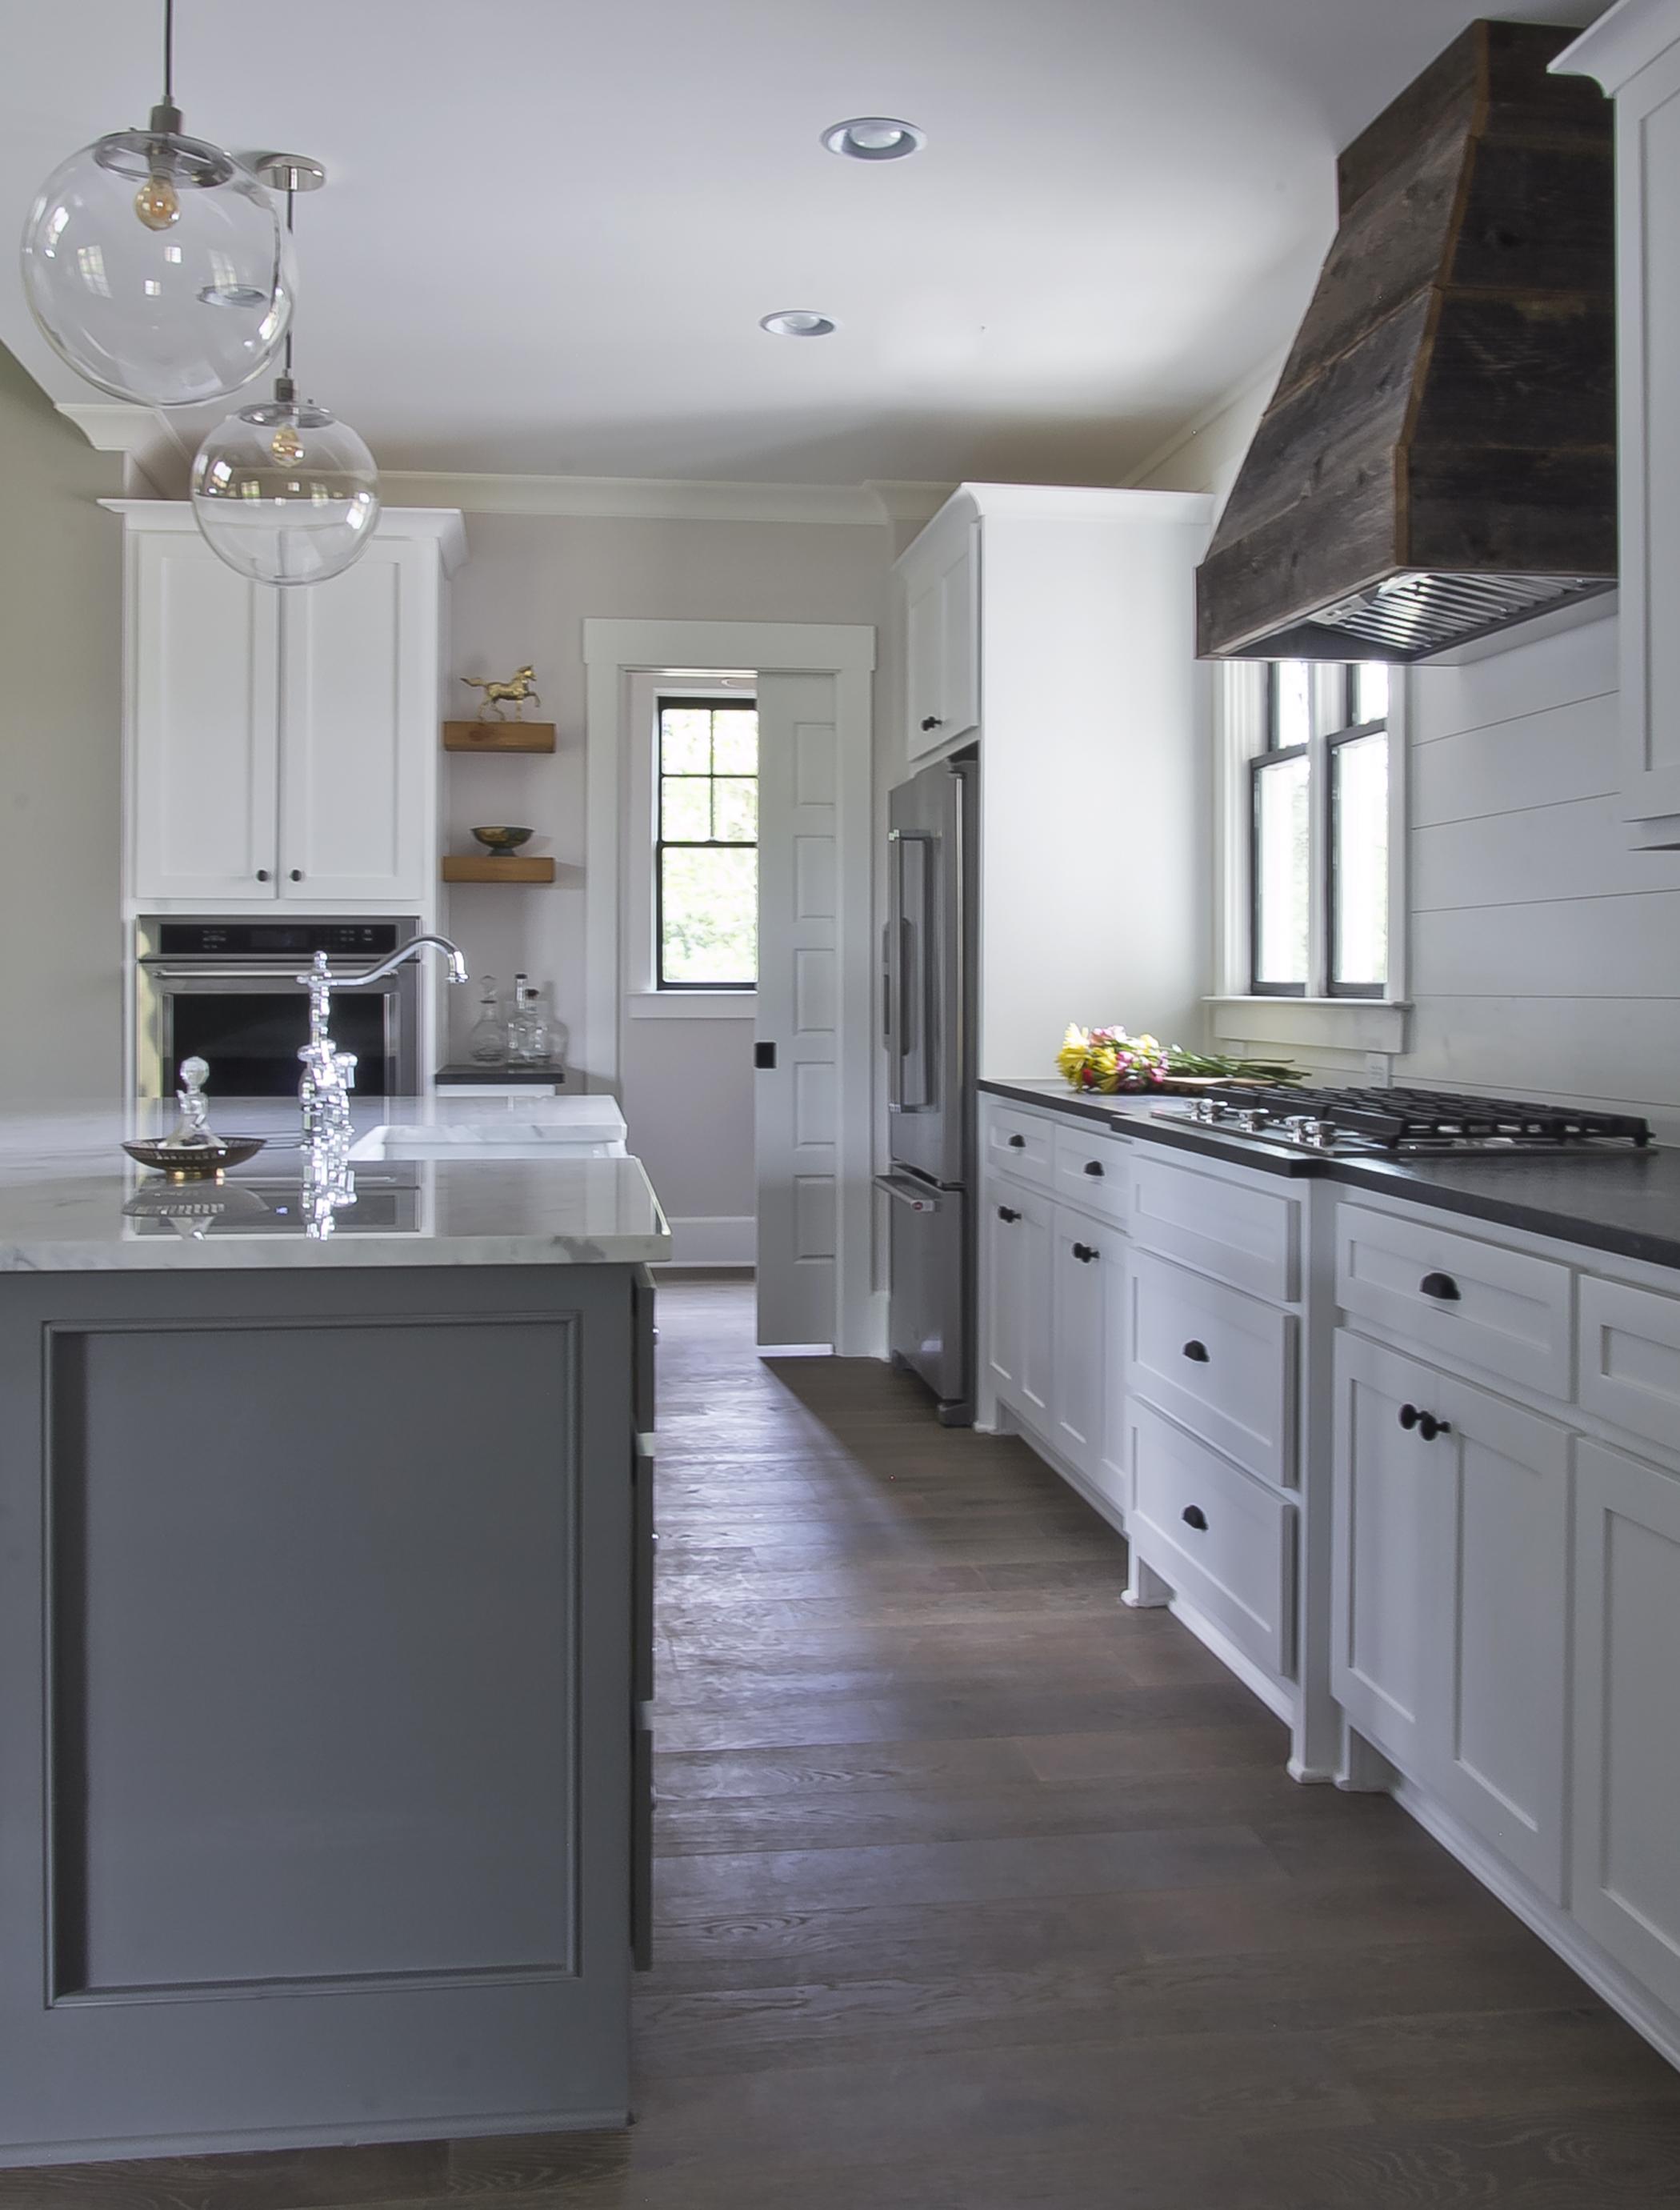 longstreet kitchen pantry.jpg